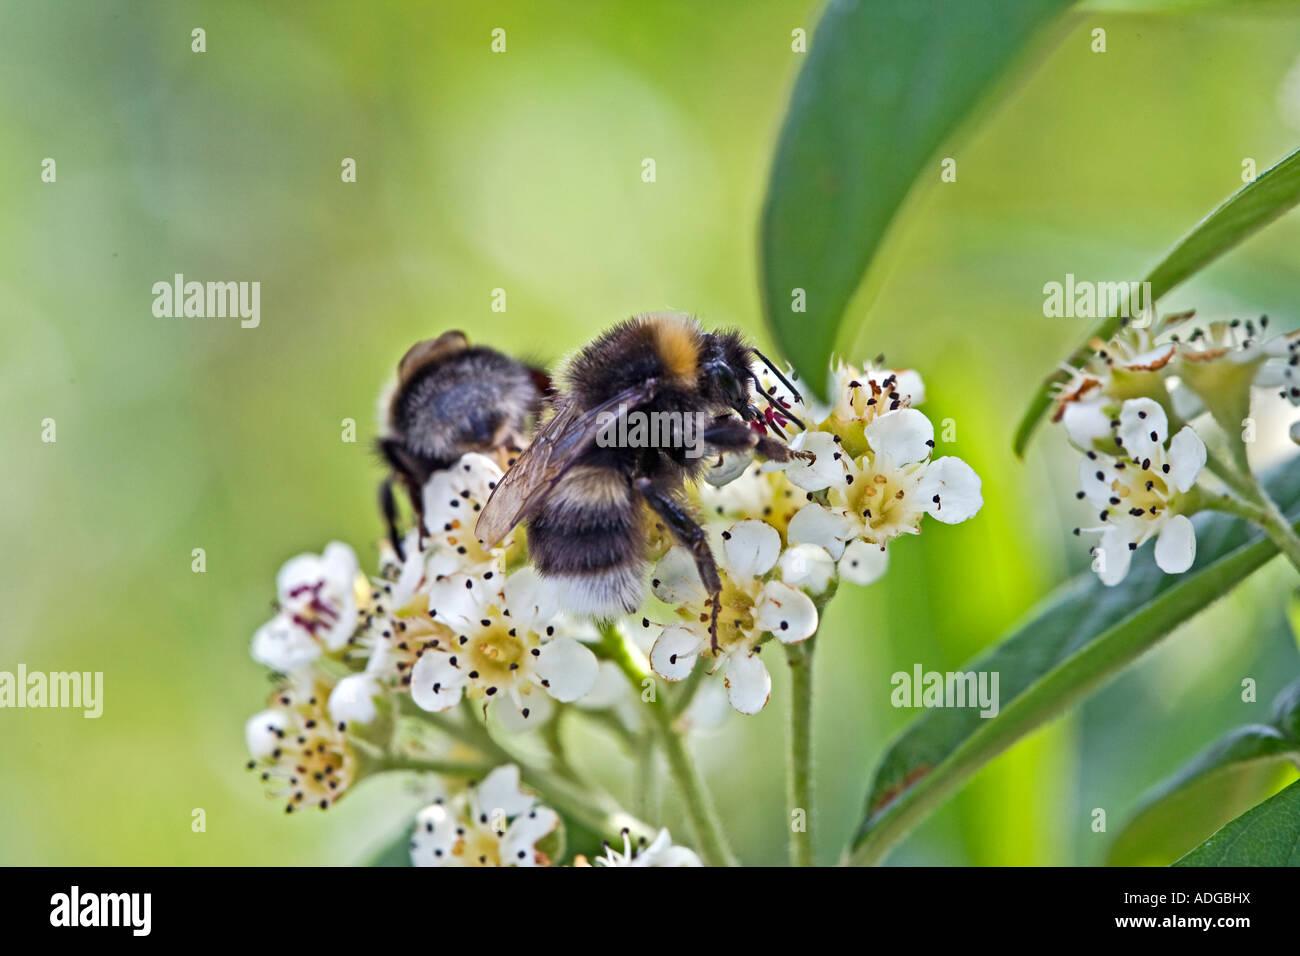 Two bumble bees gathering pollen English garden - Stock Image